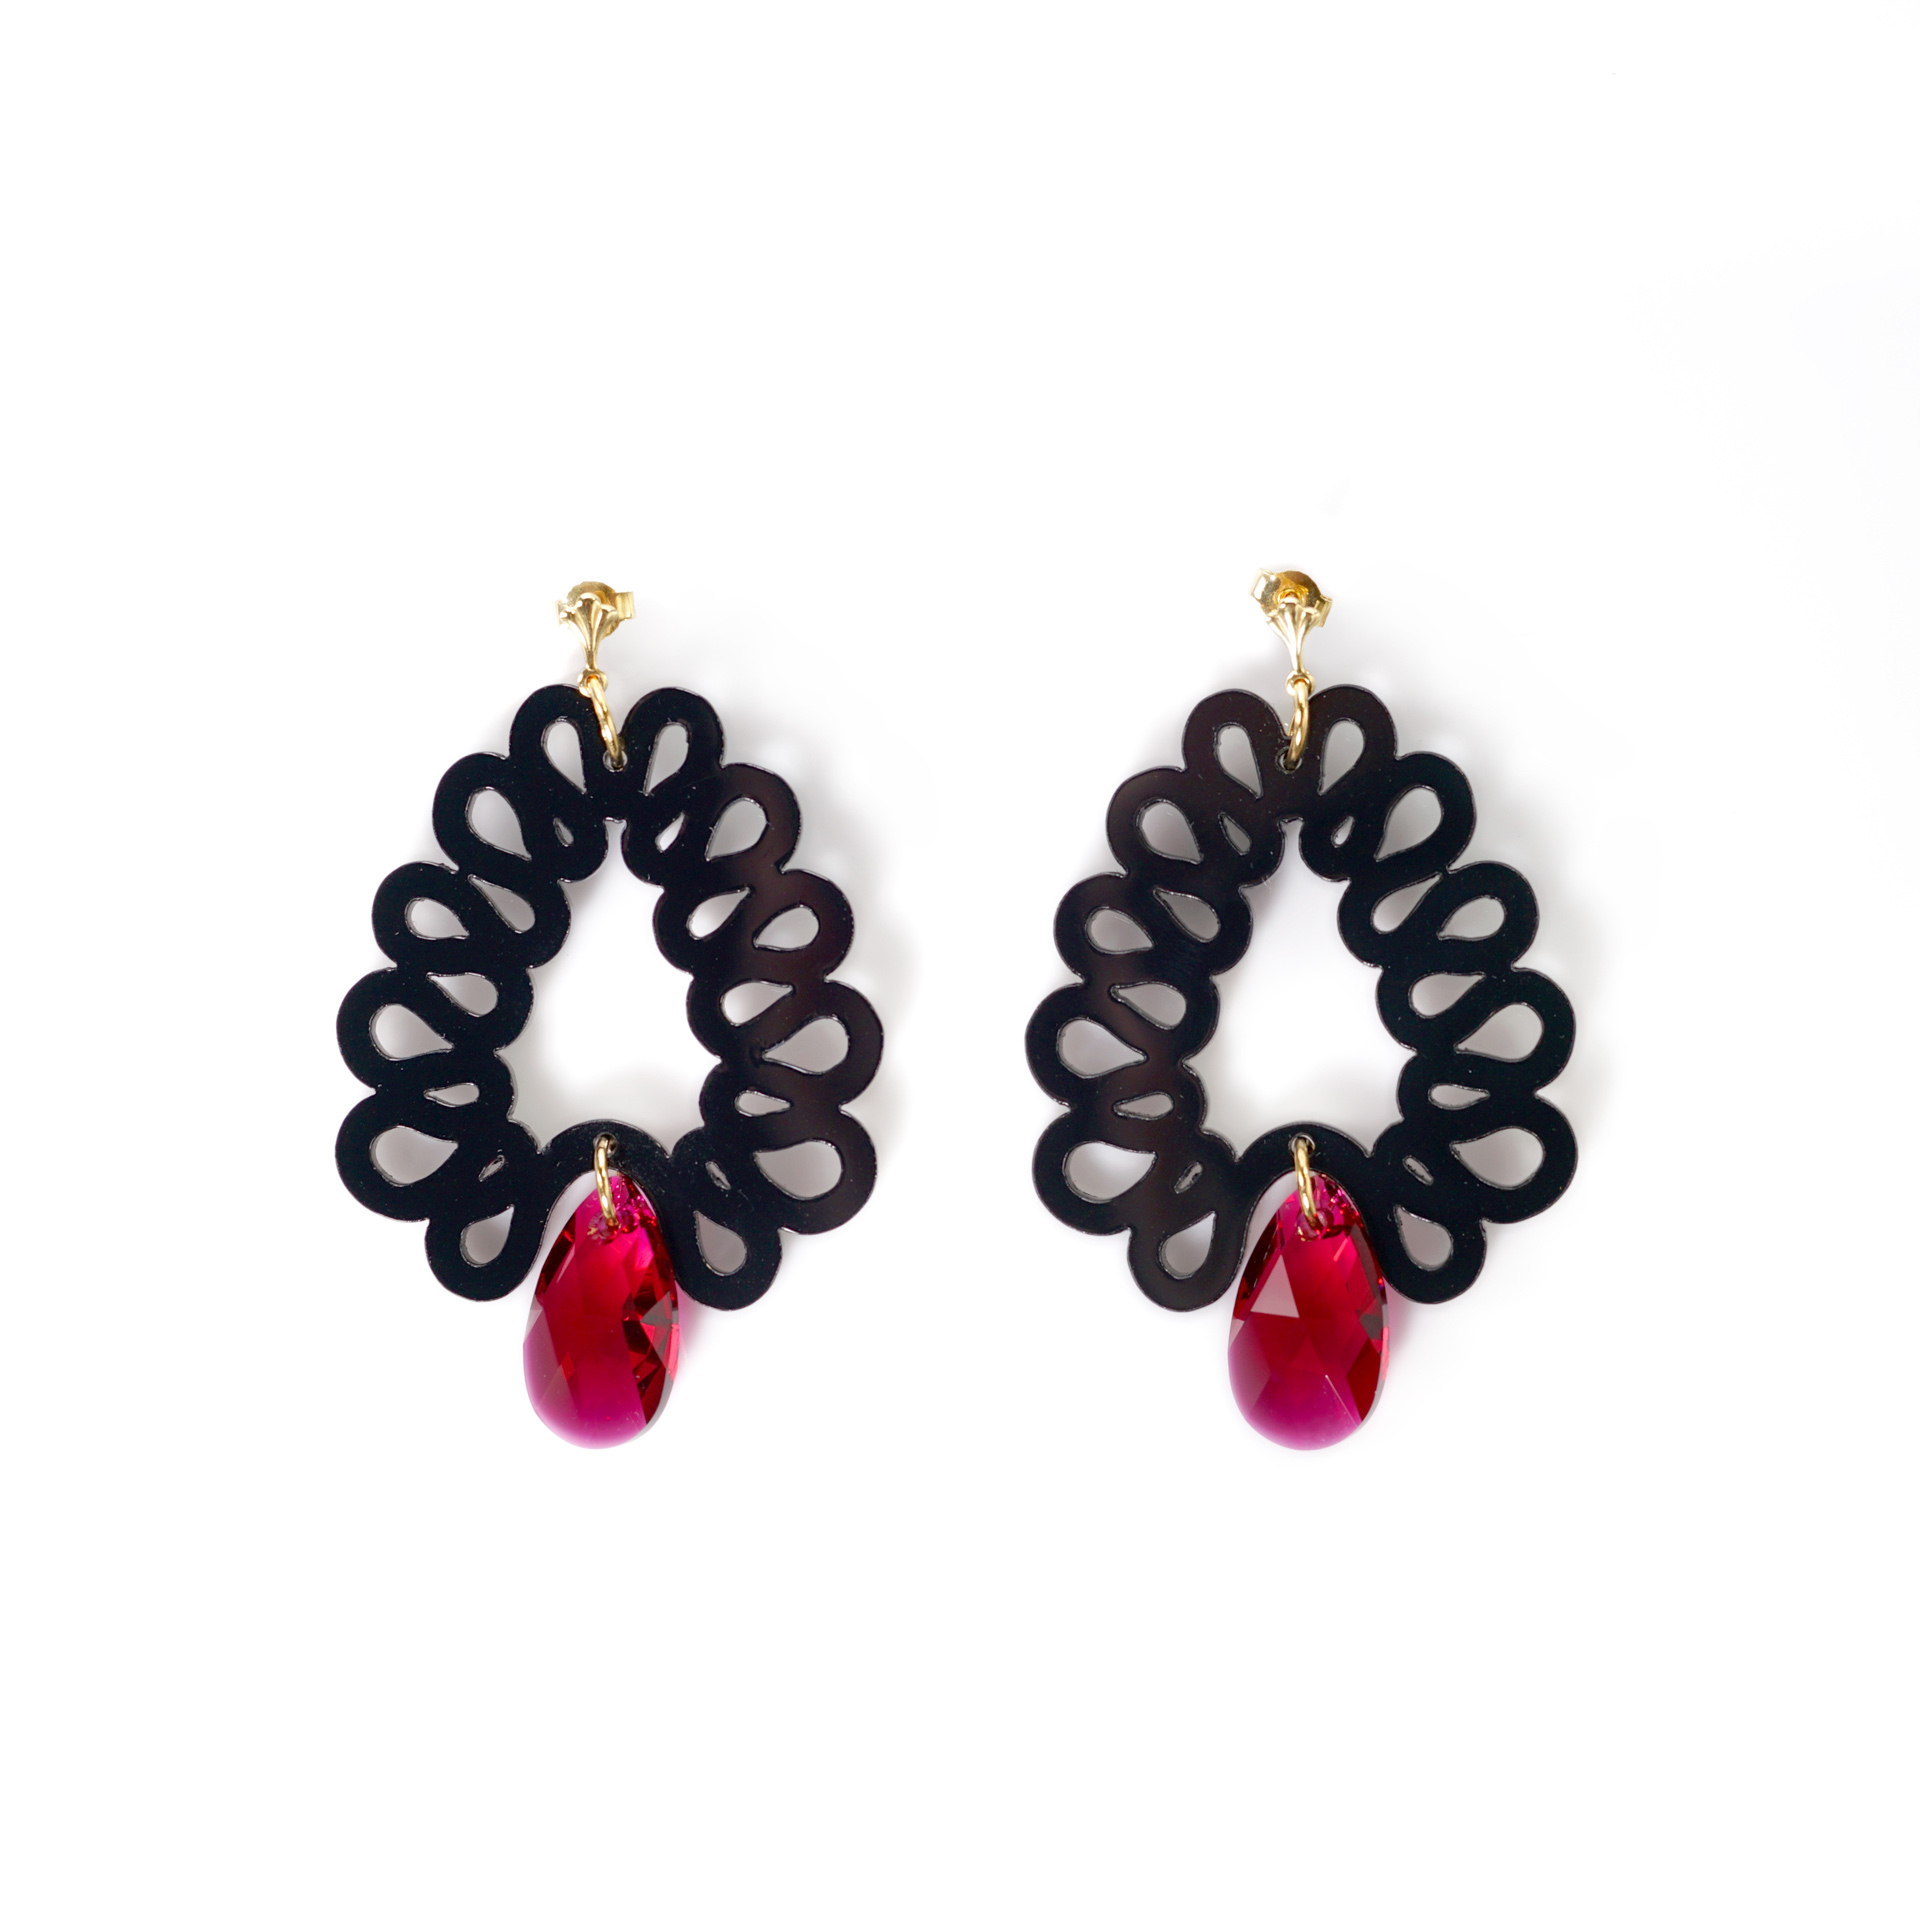 E2RD, CoExiste Collection, earrings, 48,oo eur